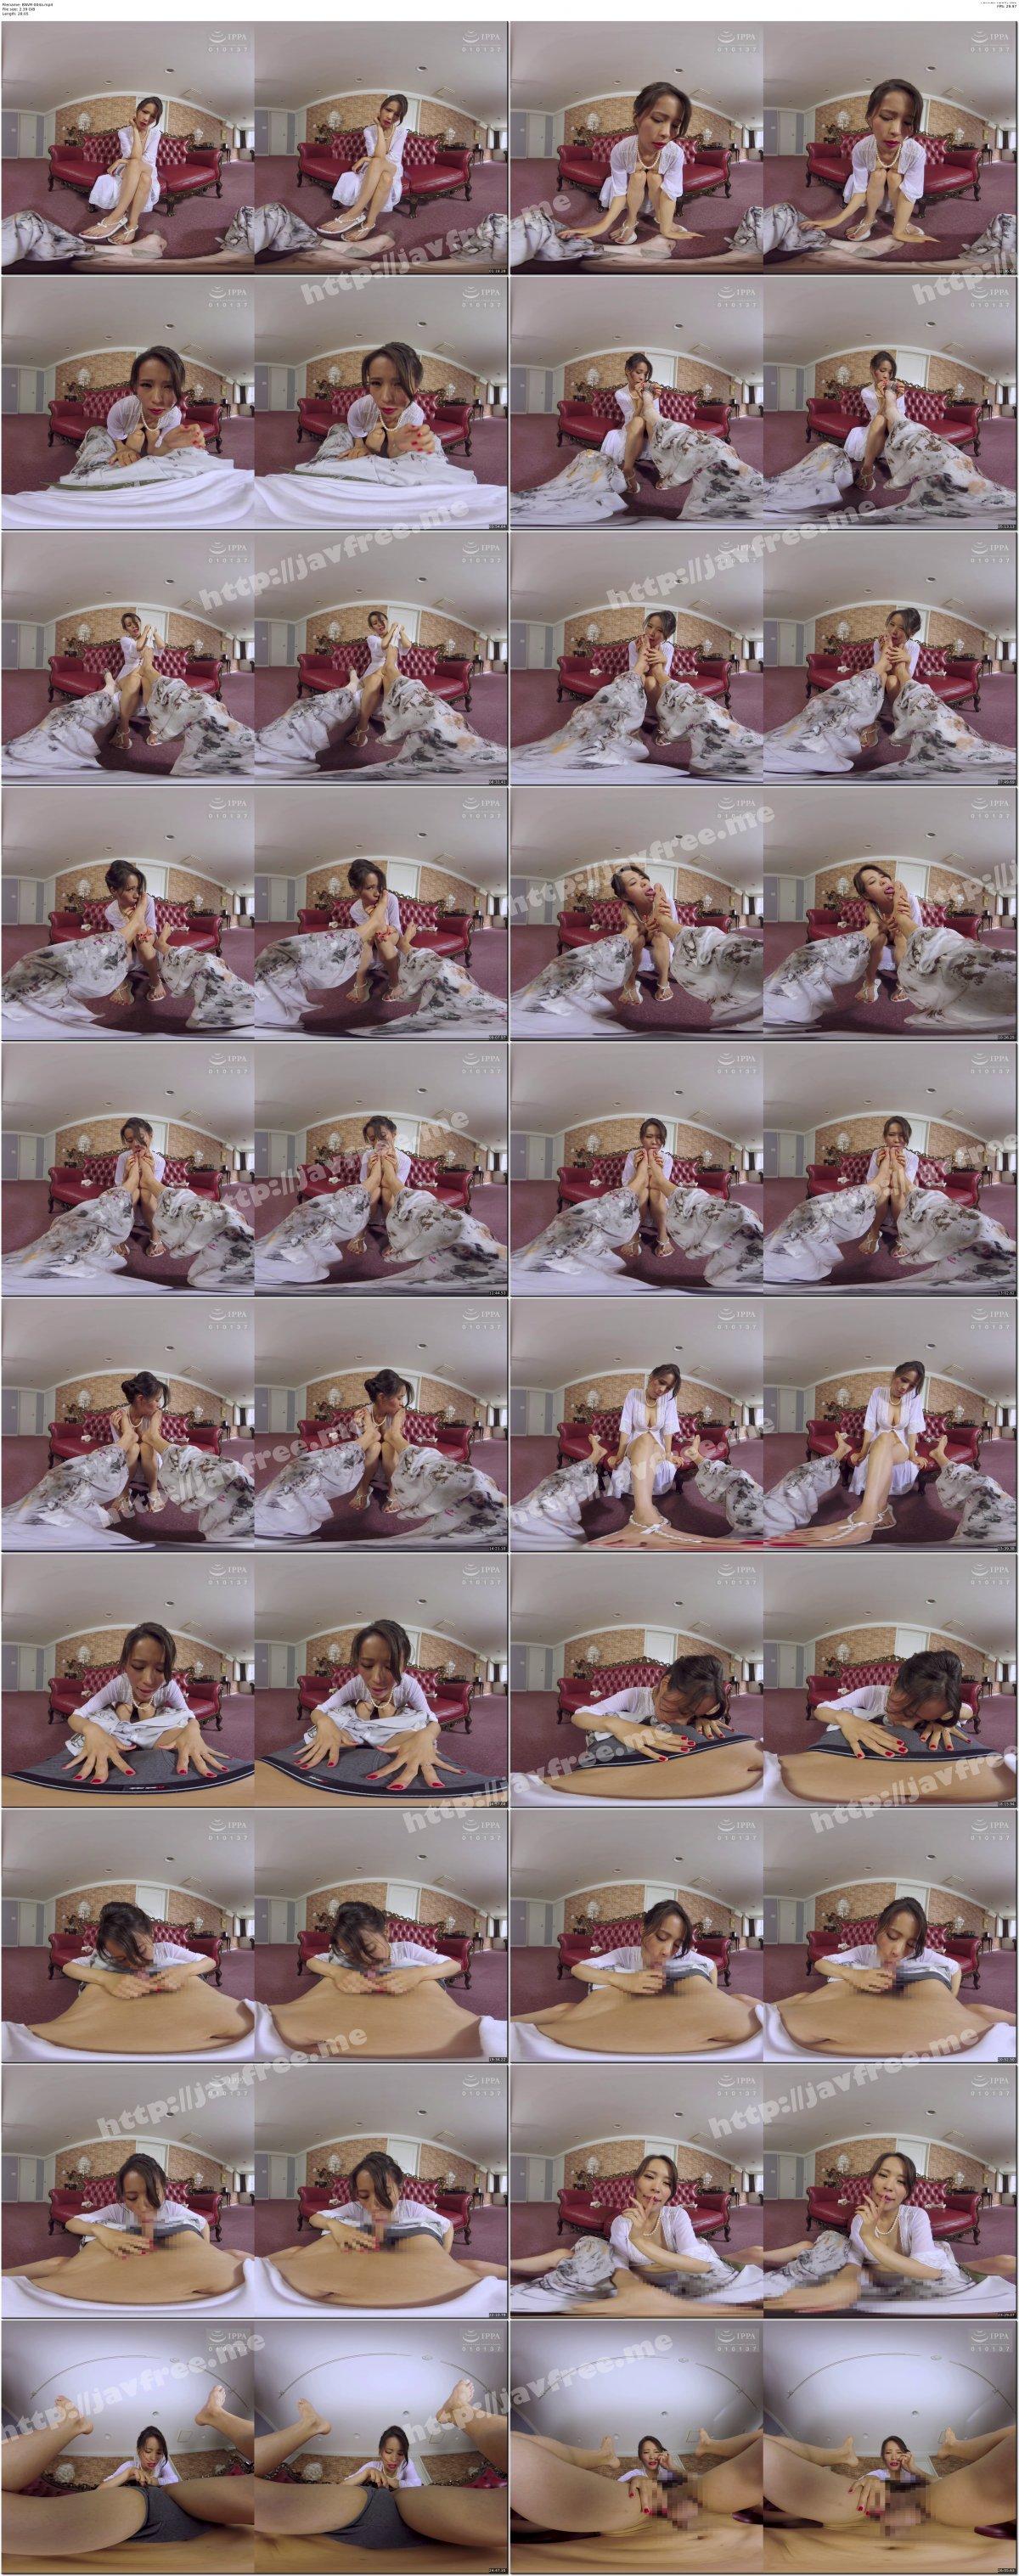 [BNVR-004] 【VR】クサい男が大好きなエマニエル夫人 真木今日子 - image BNVR-004a on https://javfree.me